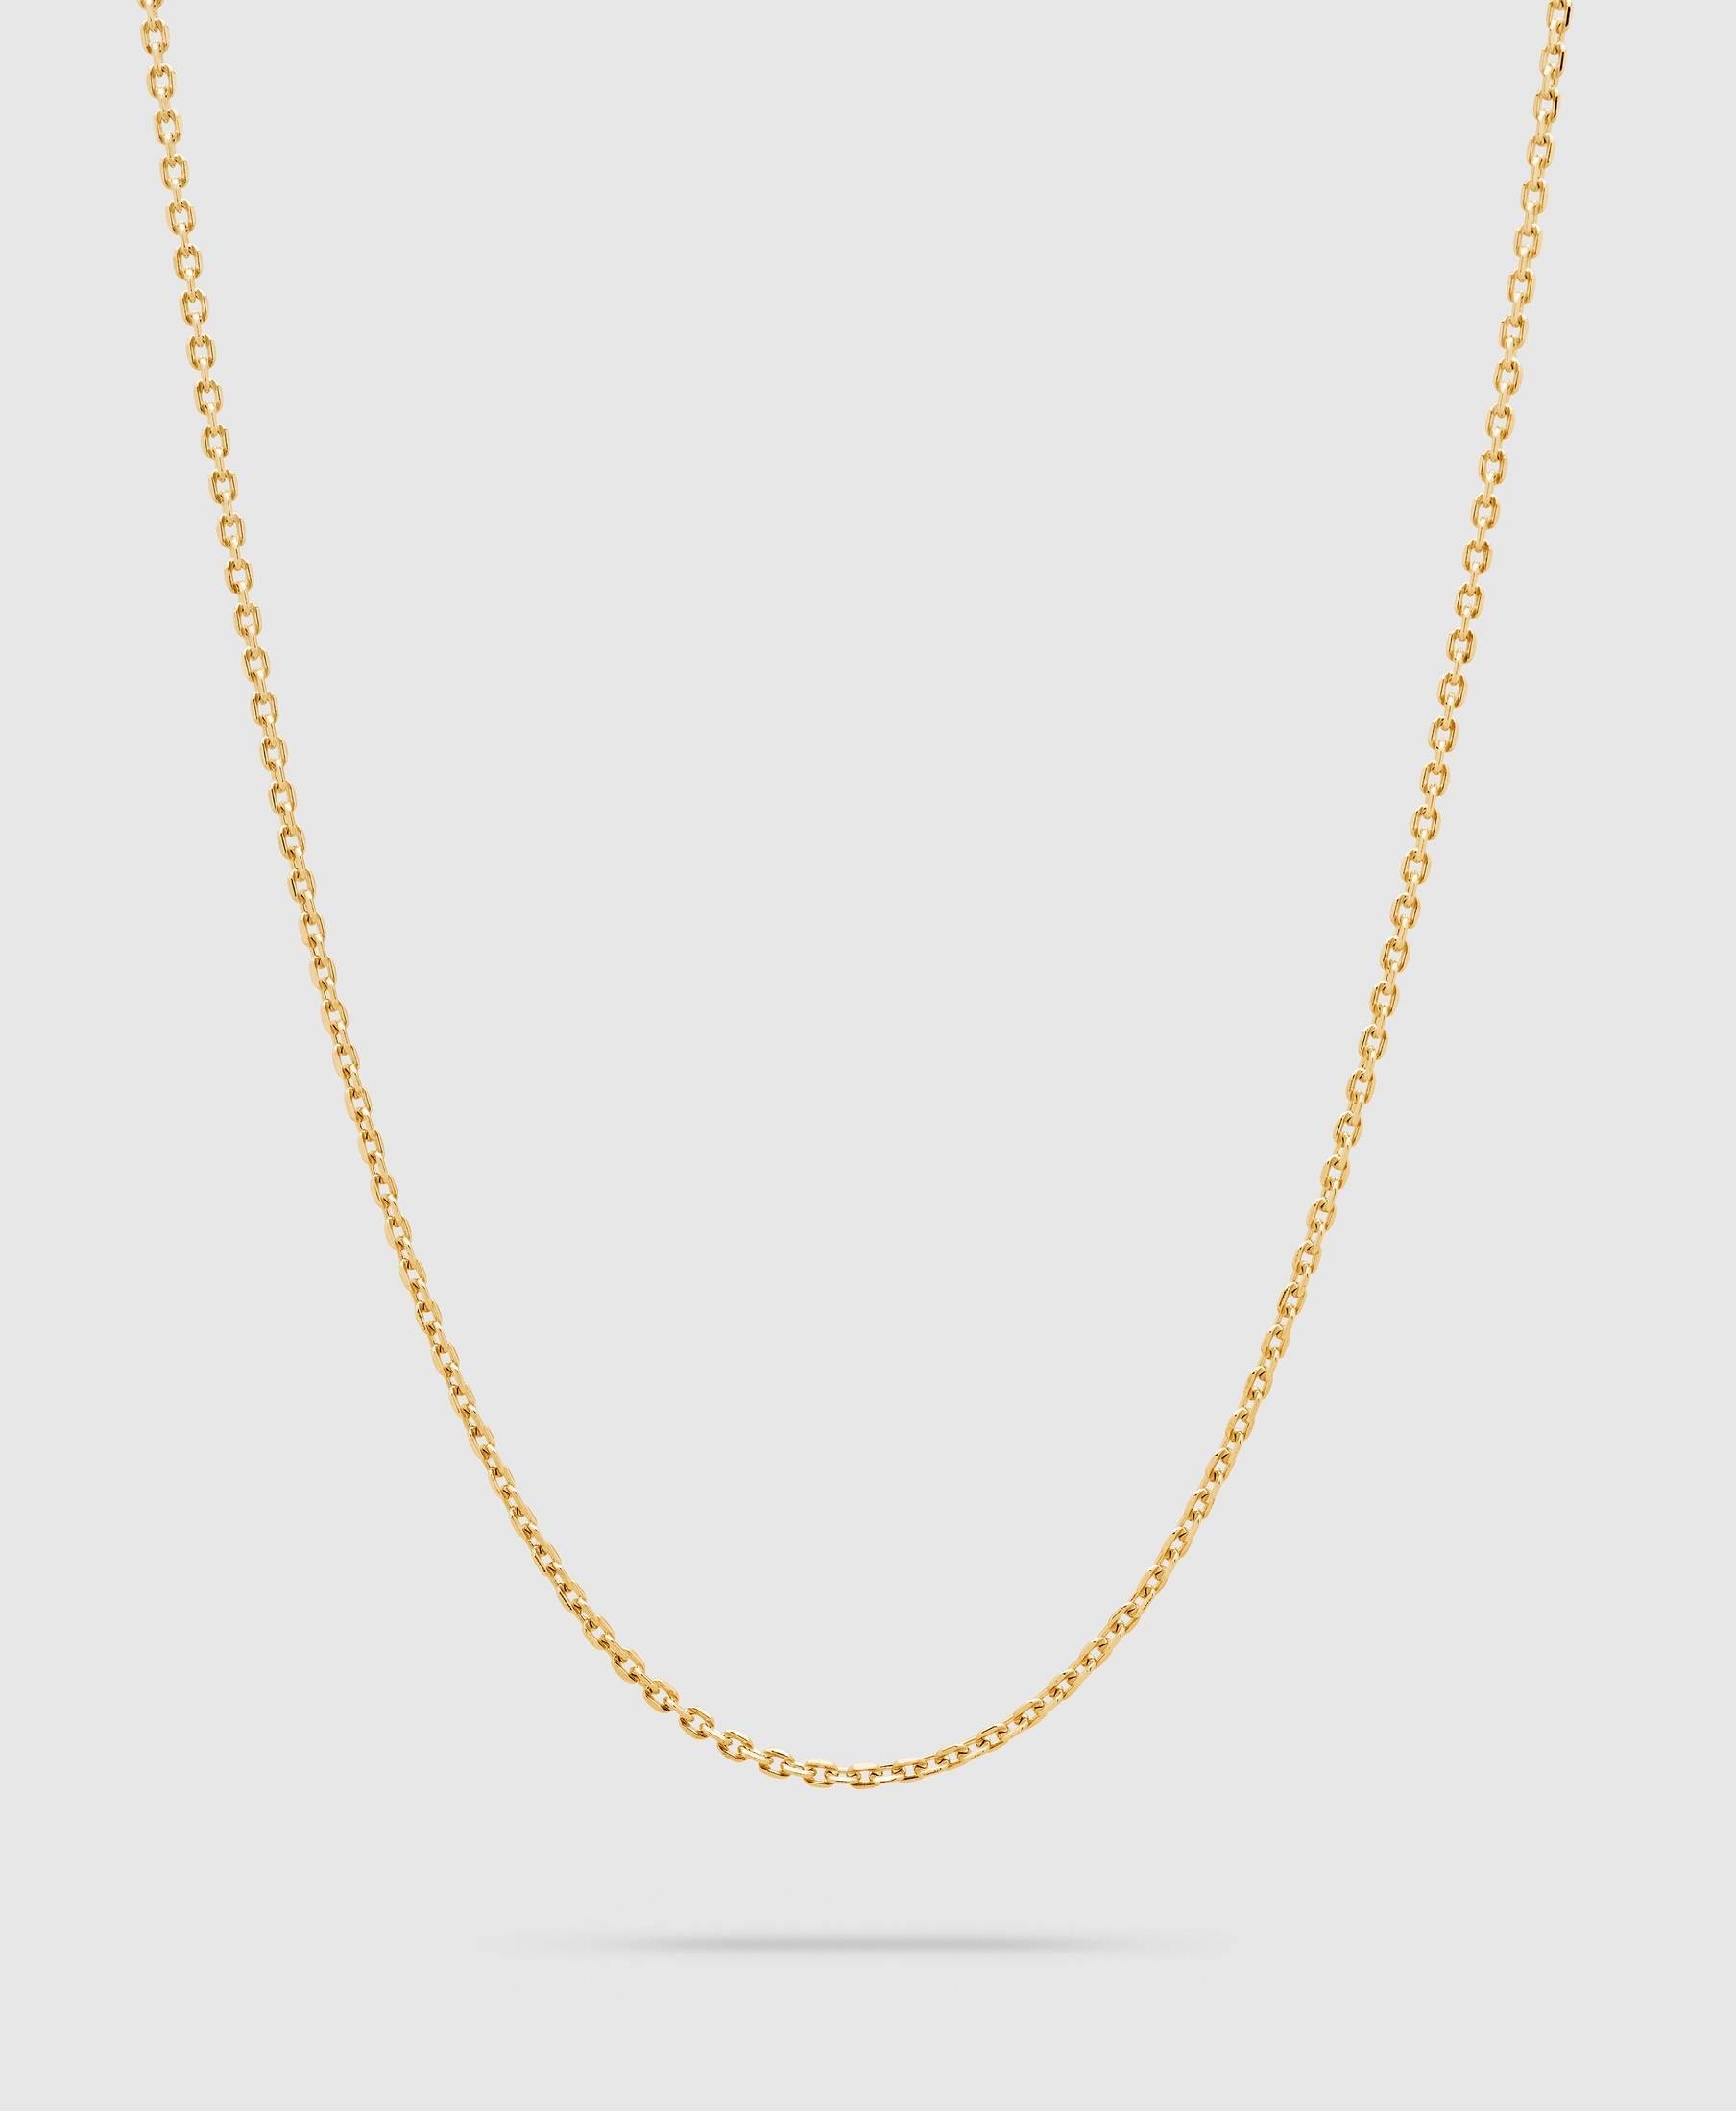 Anker Chain Slim Gold